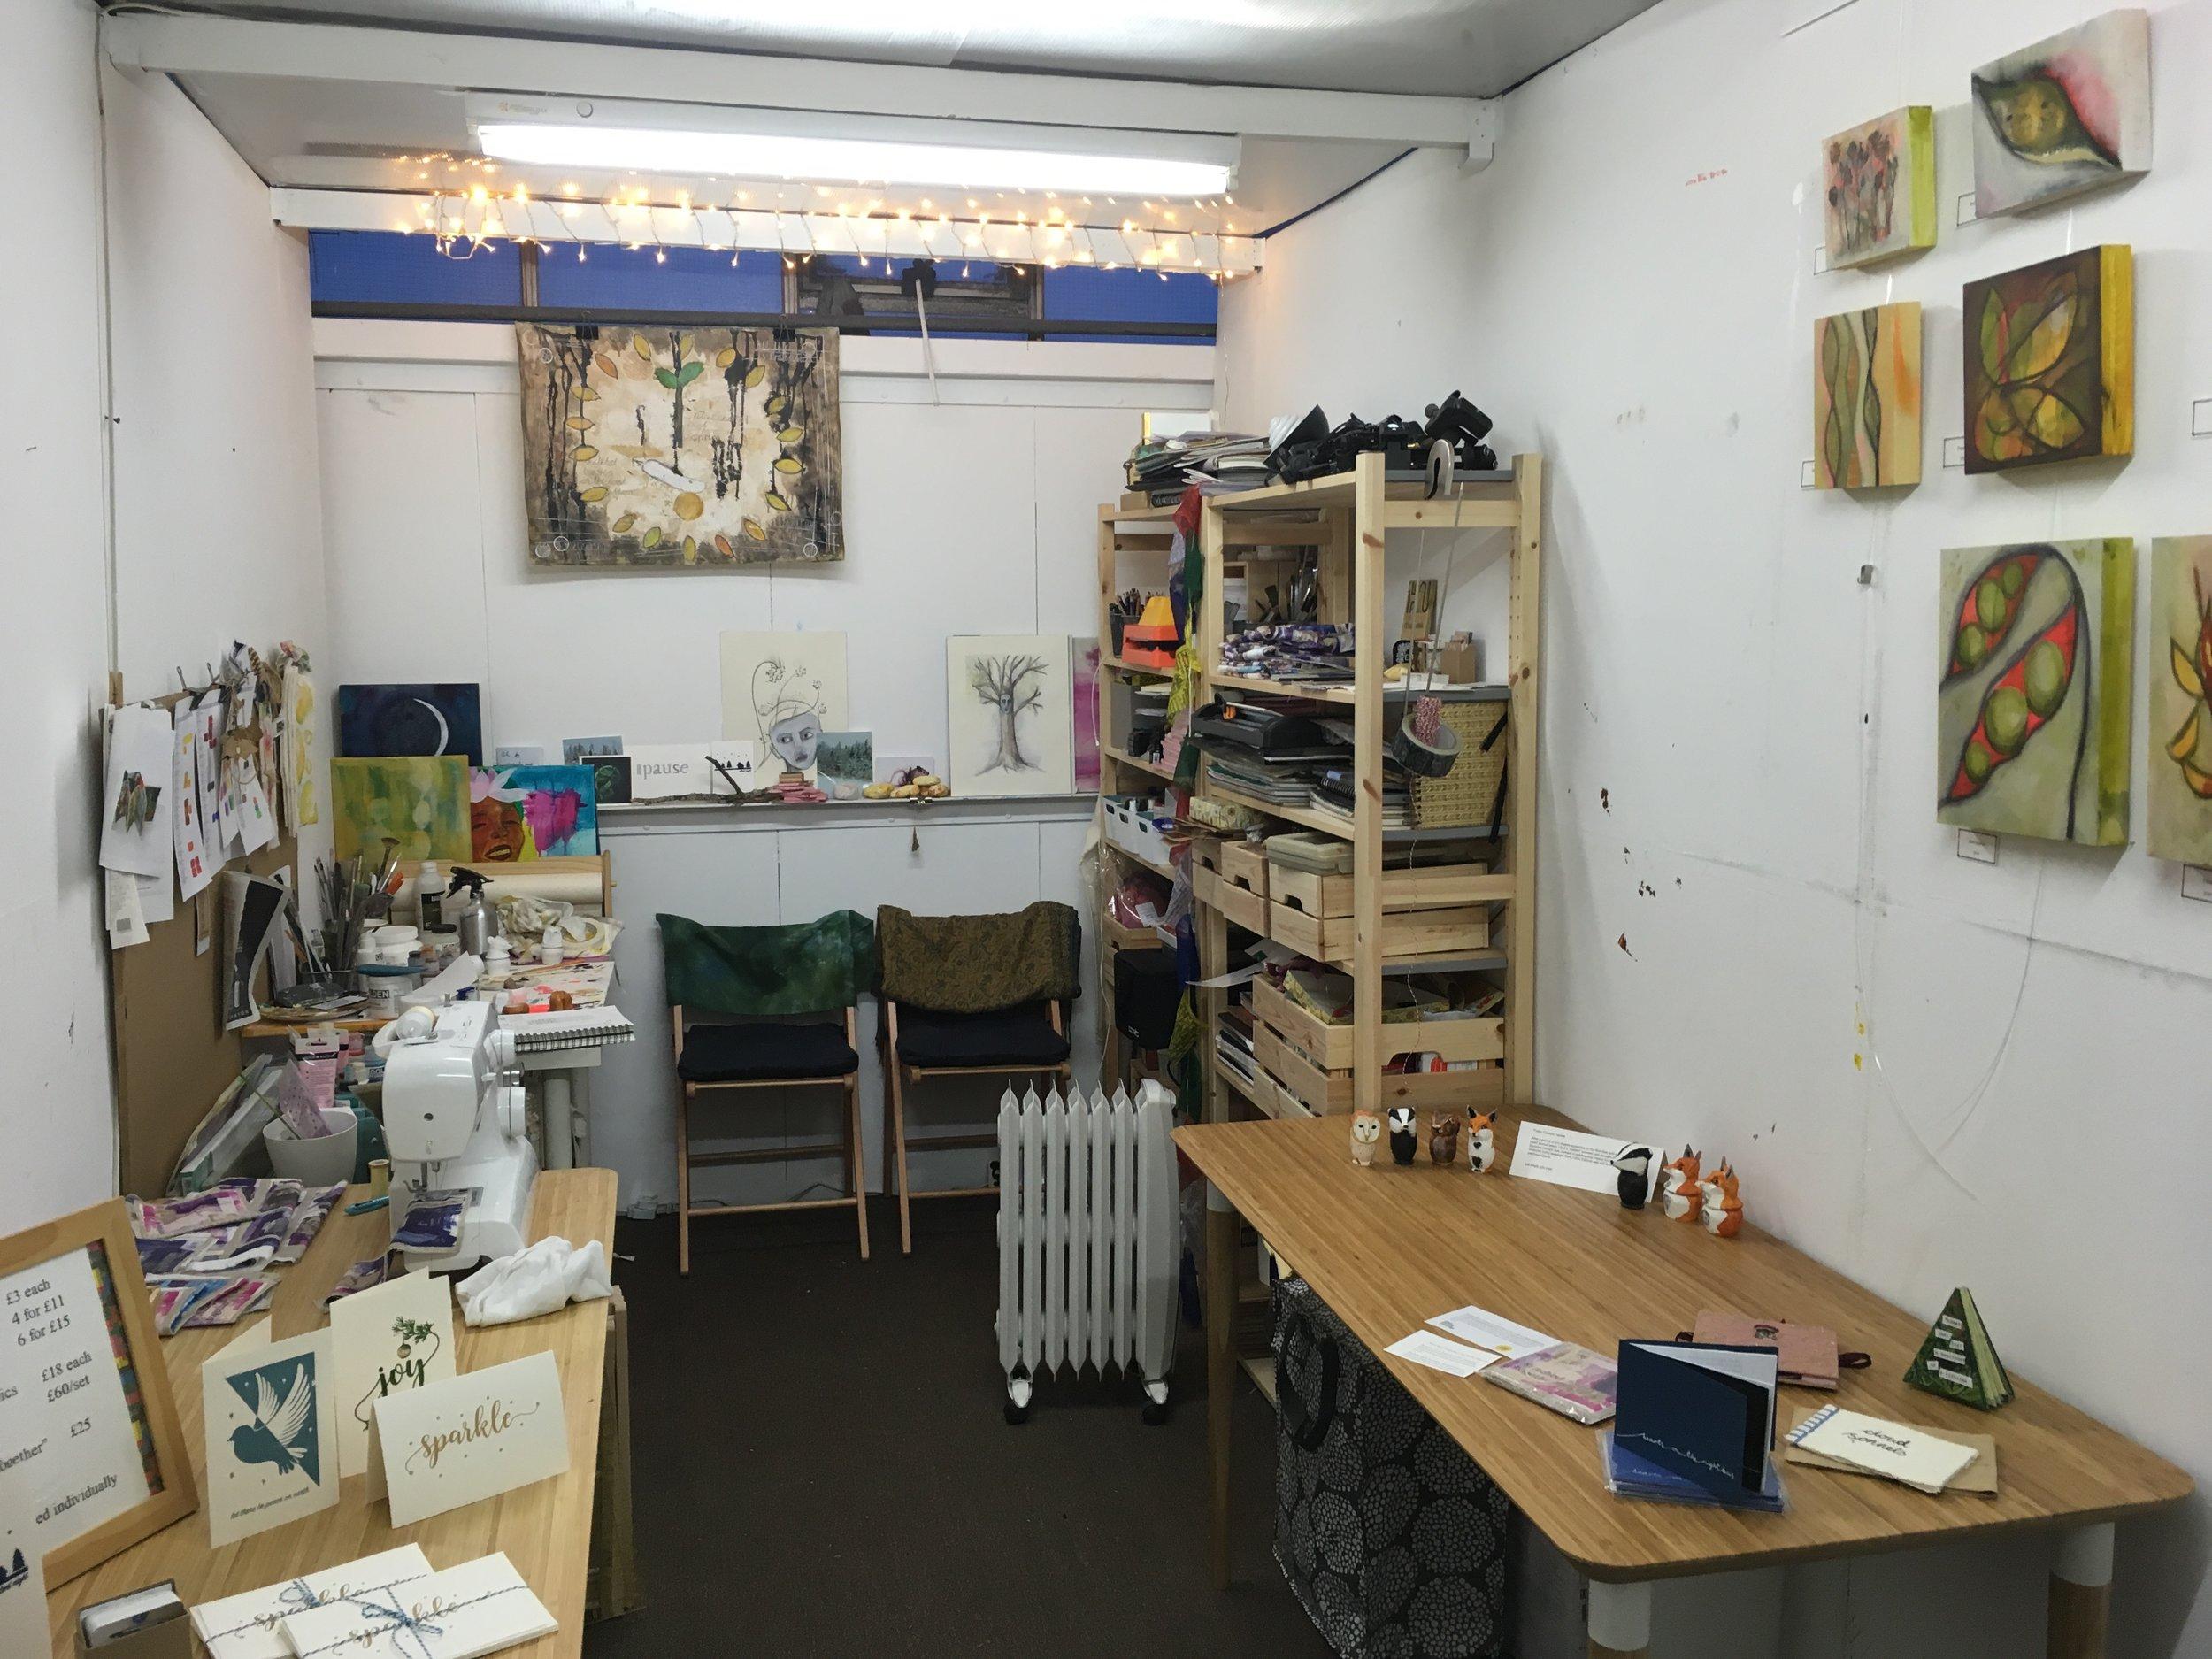 The whole studio